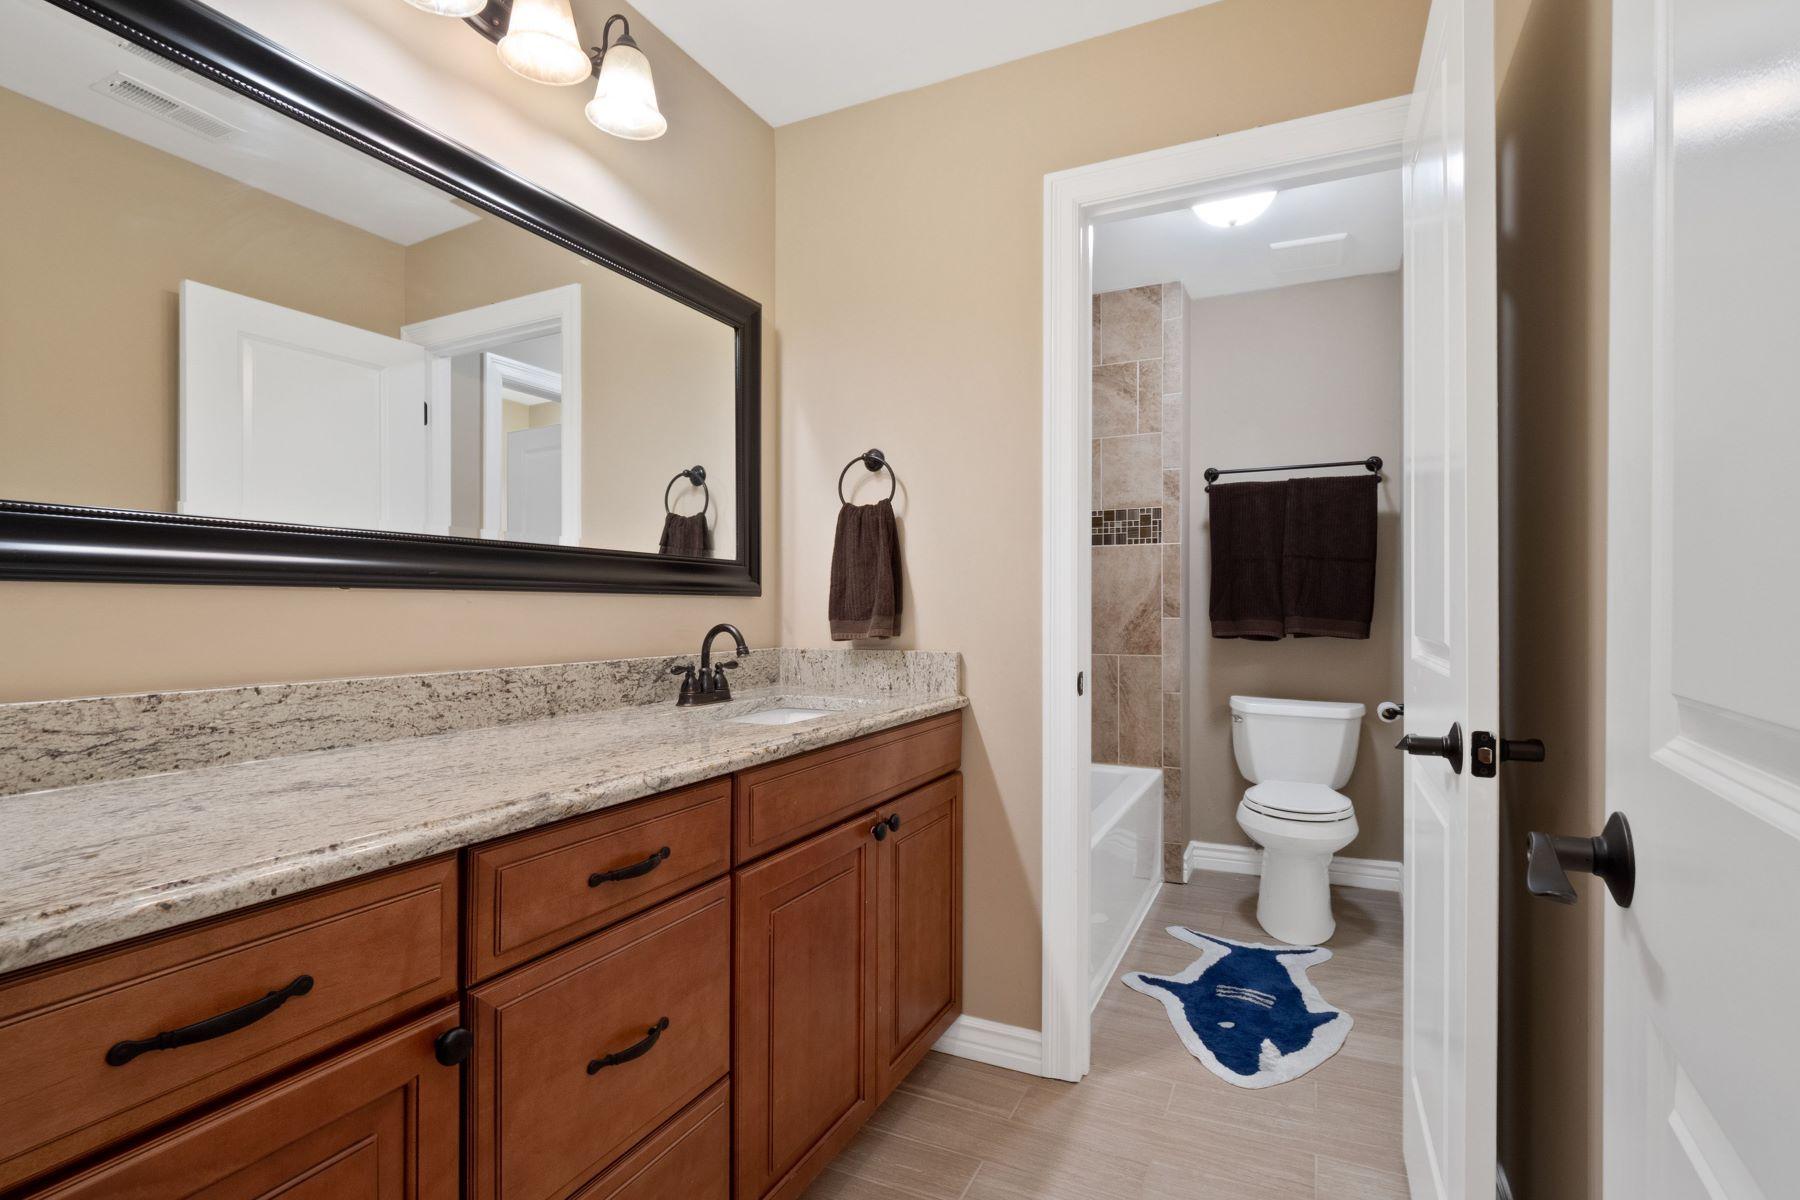 Additional photo for property listing at Beautiful Executive Home 908 Coronet Drive Ballwin, Missouri 63011 United States